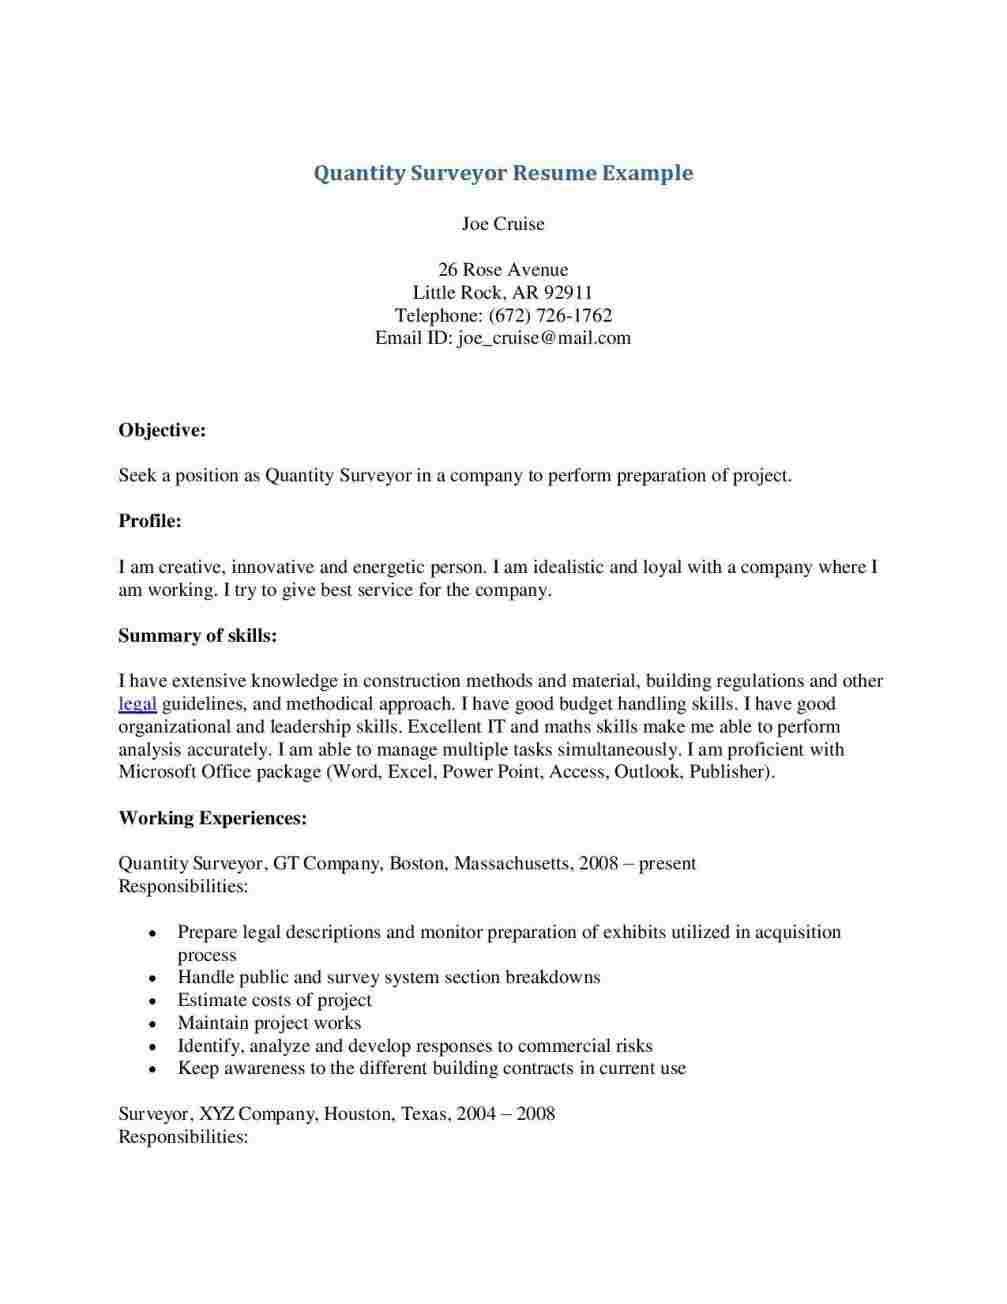 Cover Letter Template Quantity Surveyor Resume Format Resume Examples Job Resume Examples Civil Engineer Resume